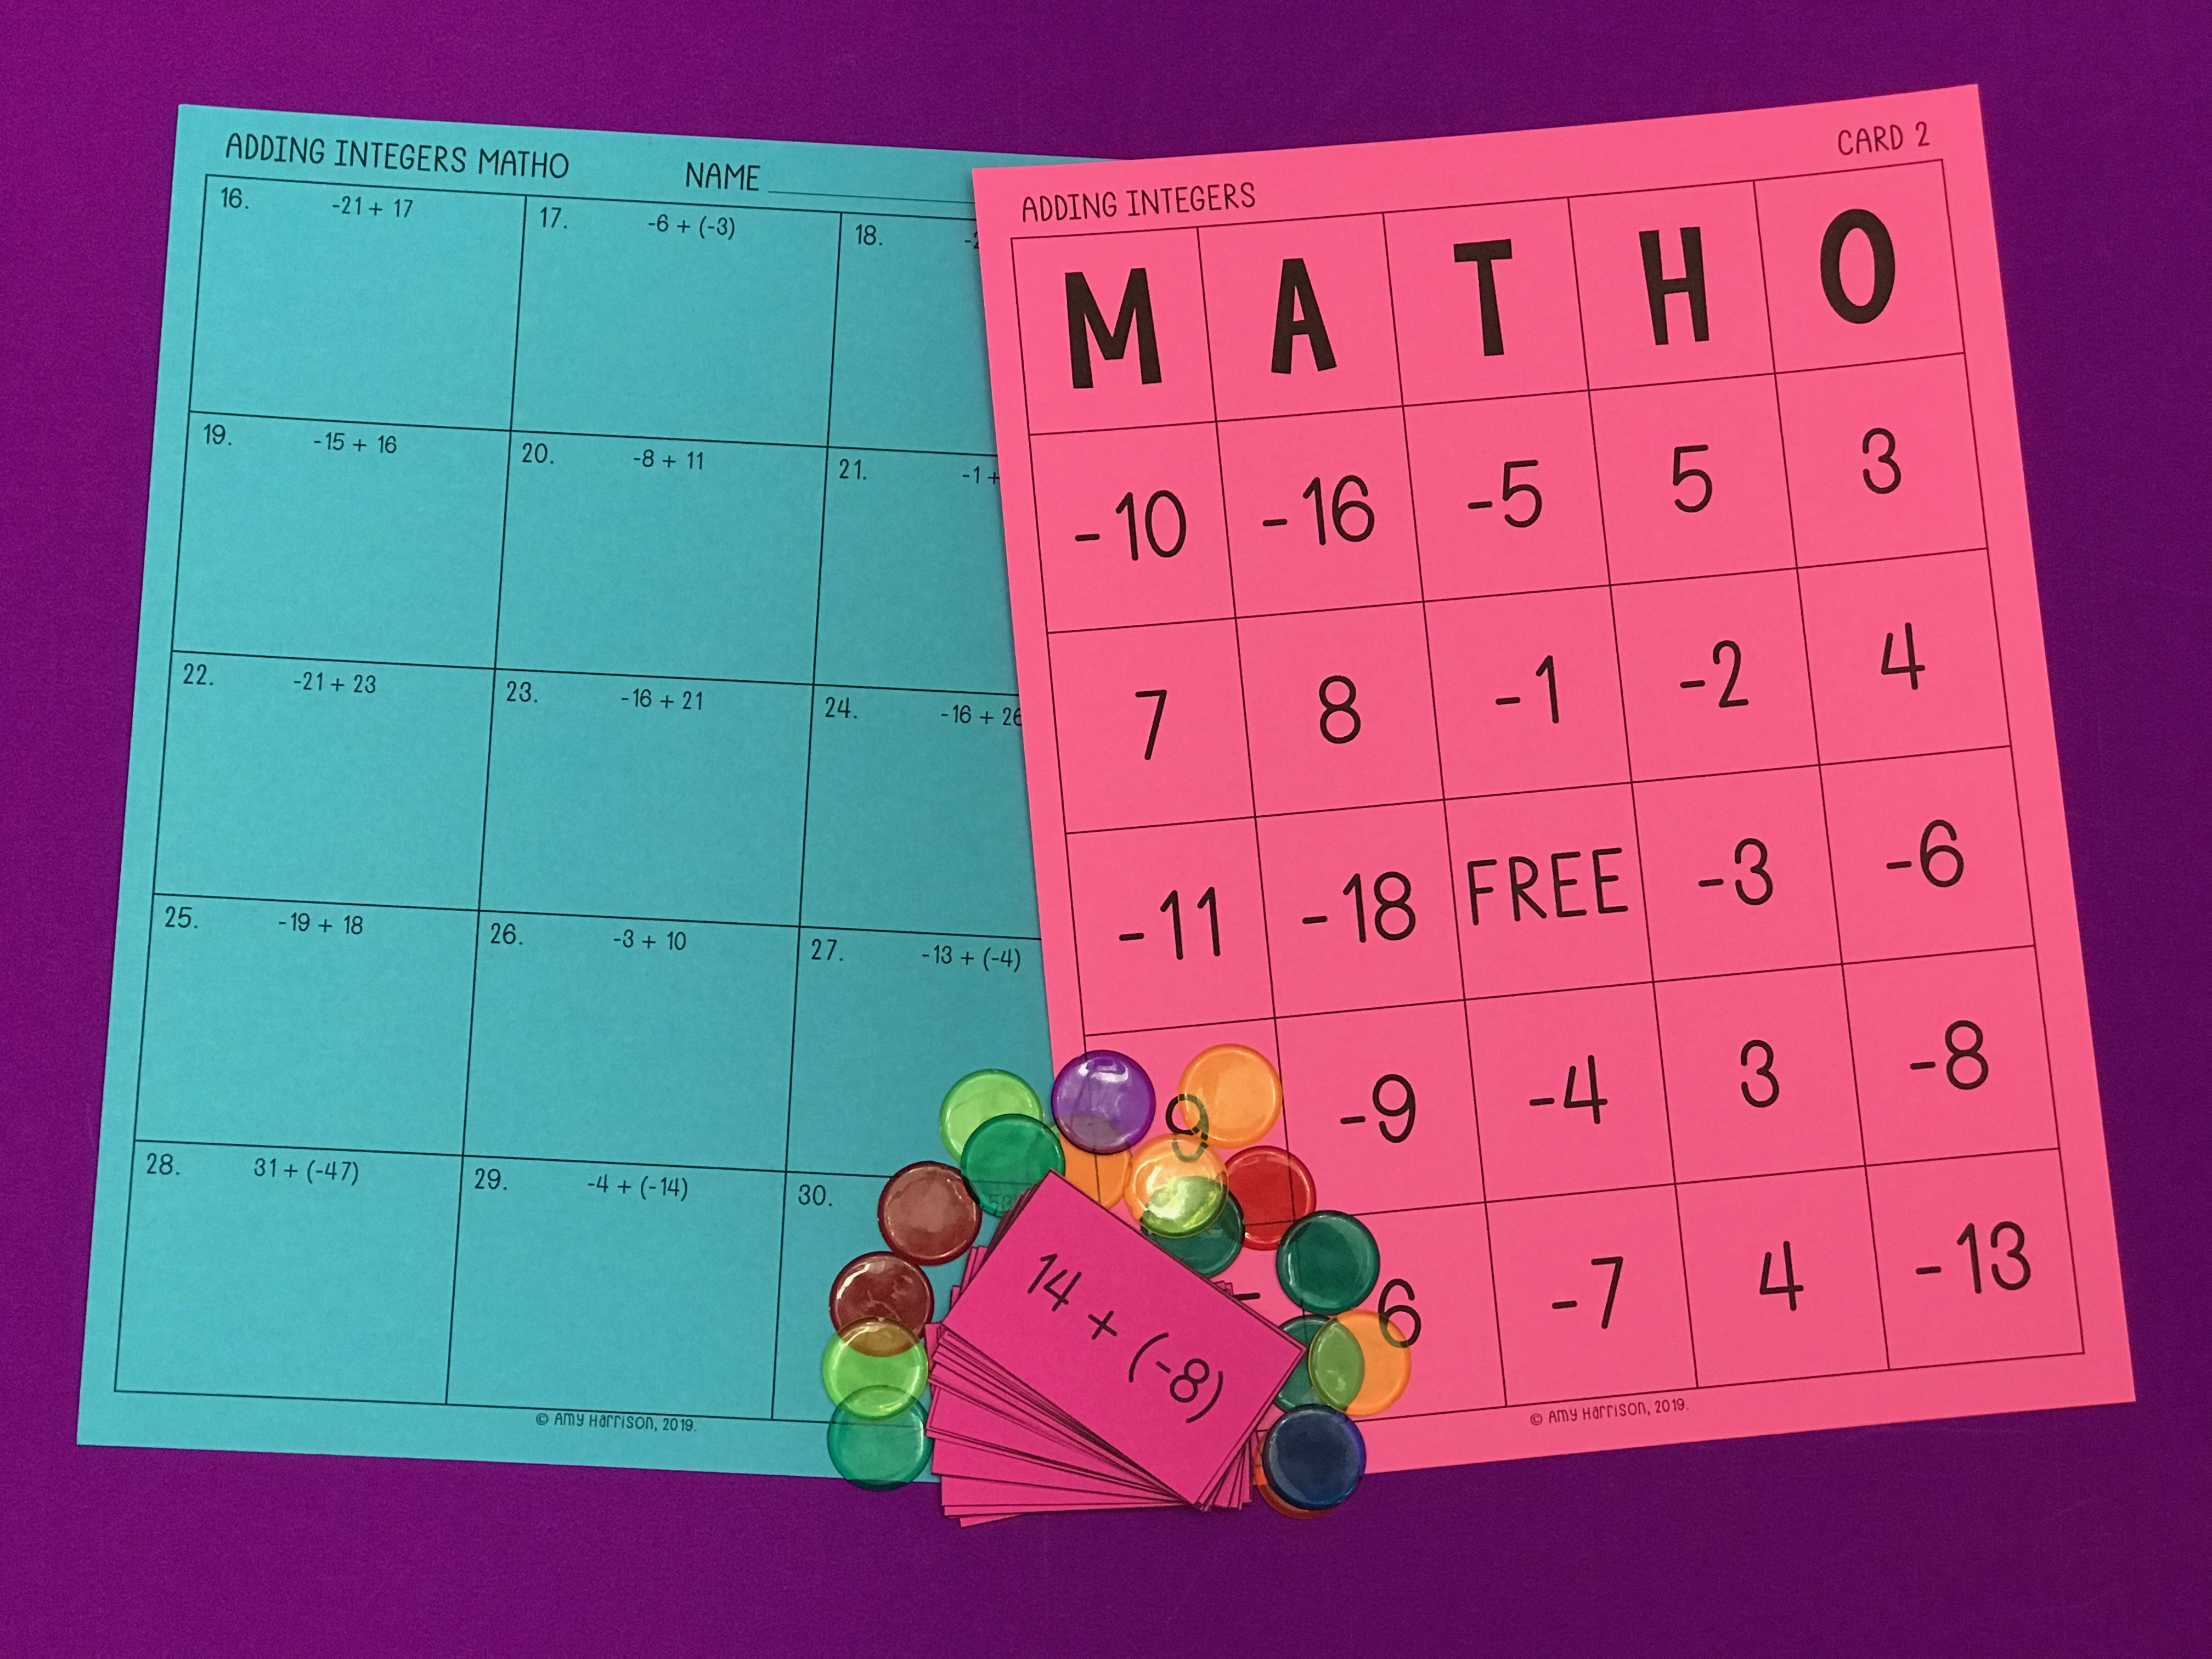 graphic about 7th Grade Math Bingo Printable called My Math Materials - Incorporating Integers MATHO (Bingo Sport)